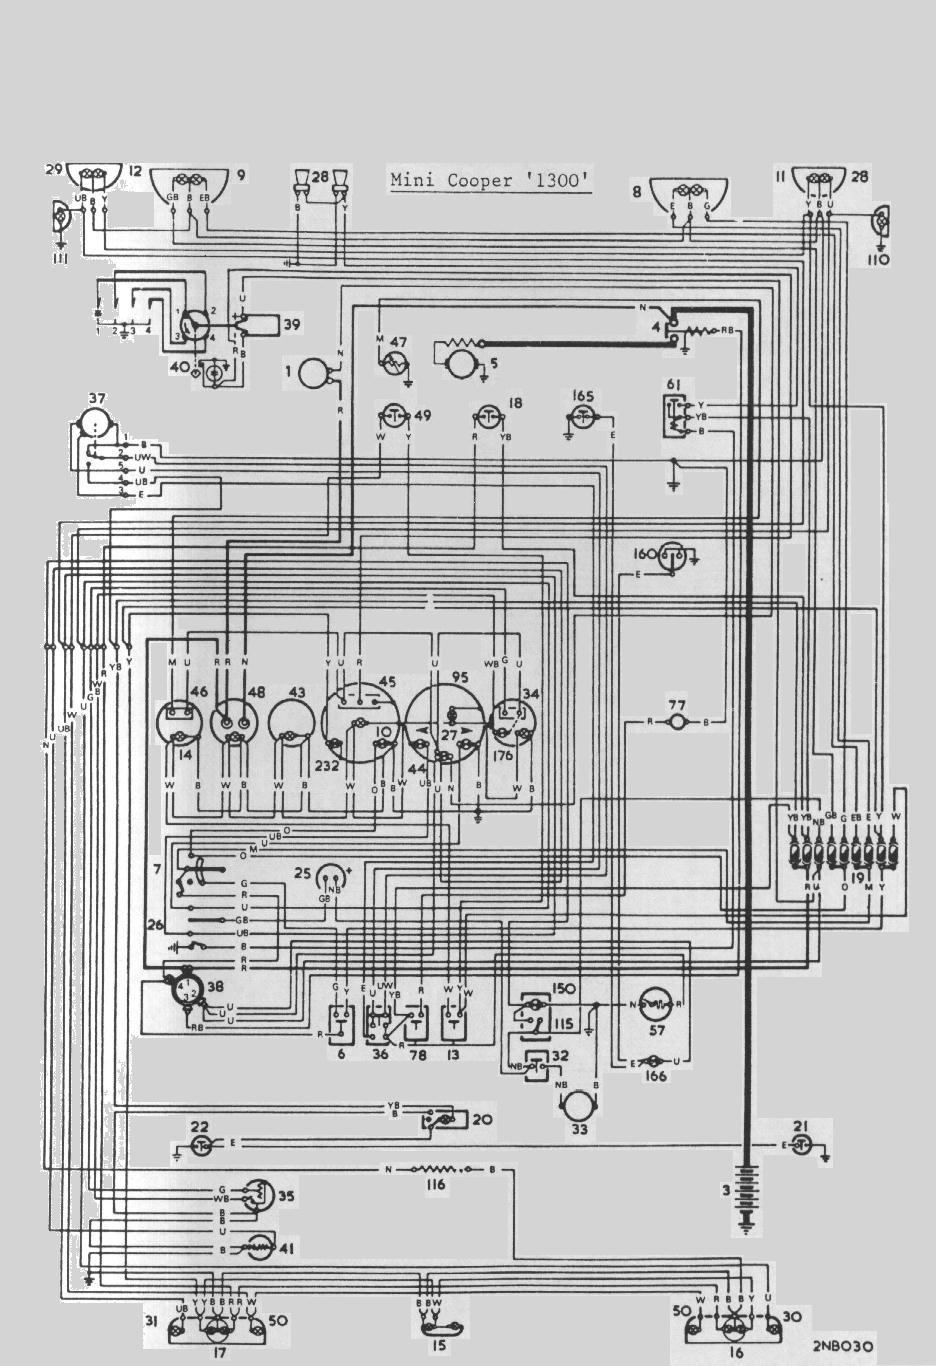 medium resolution of inno cooper 1300